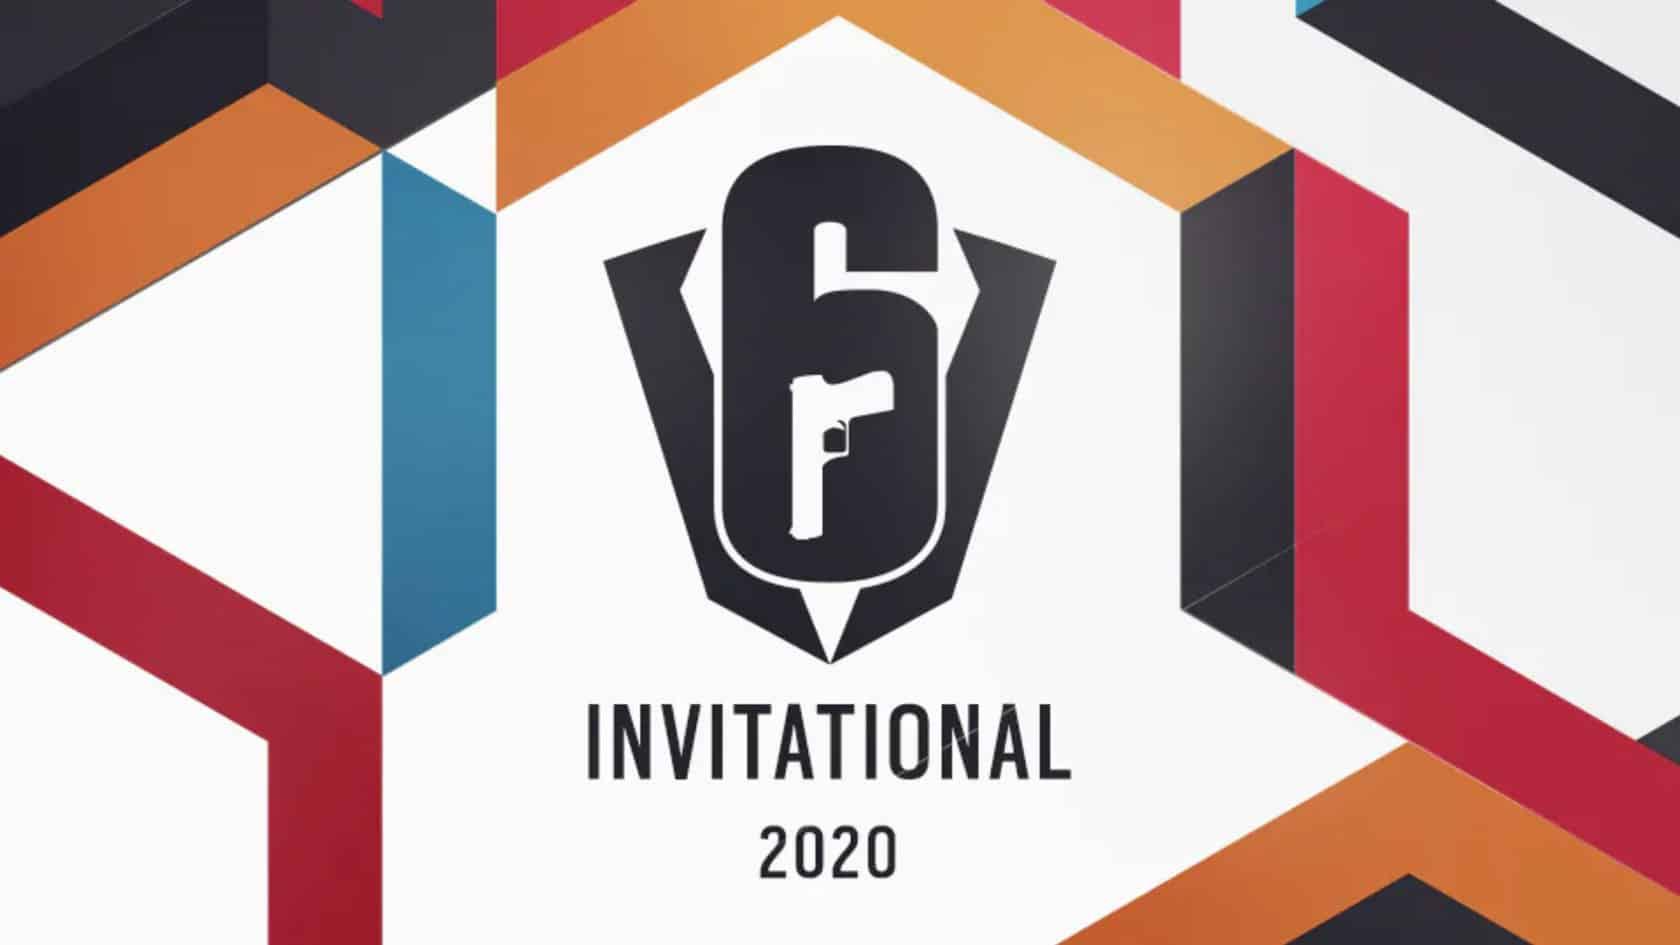 six invitational 2020 header babt